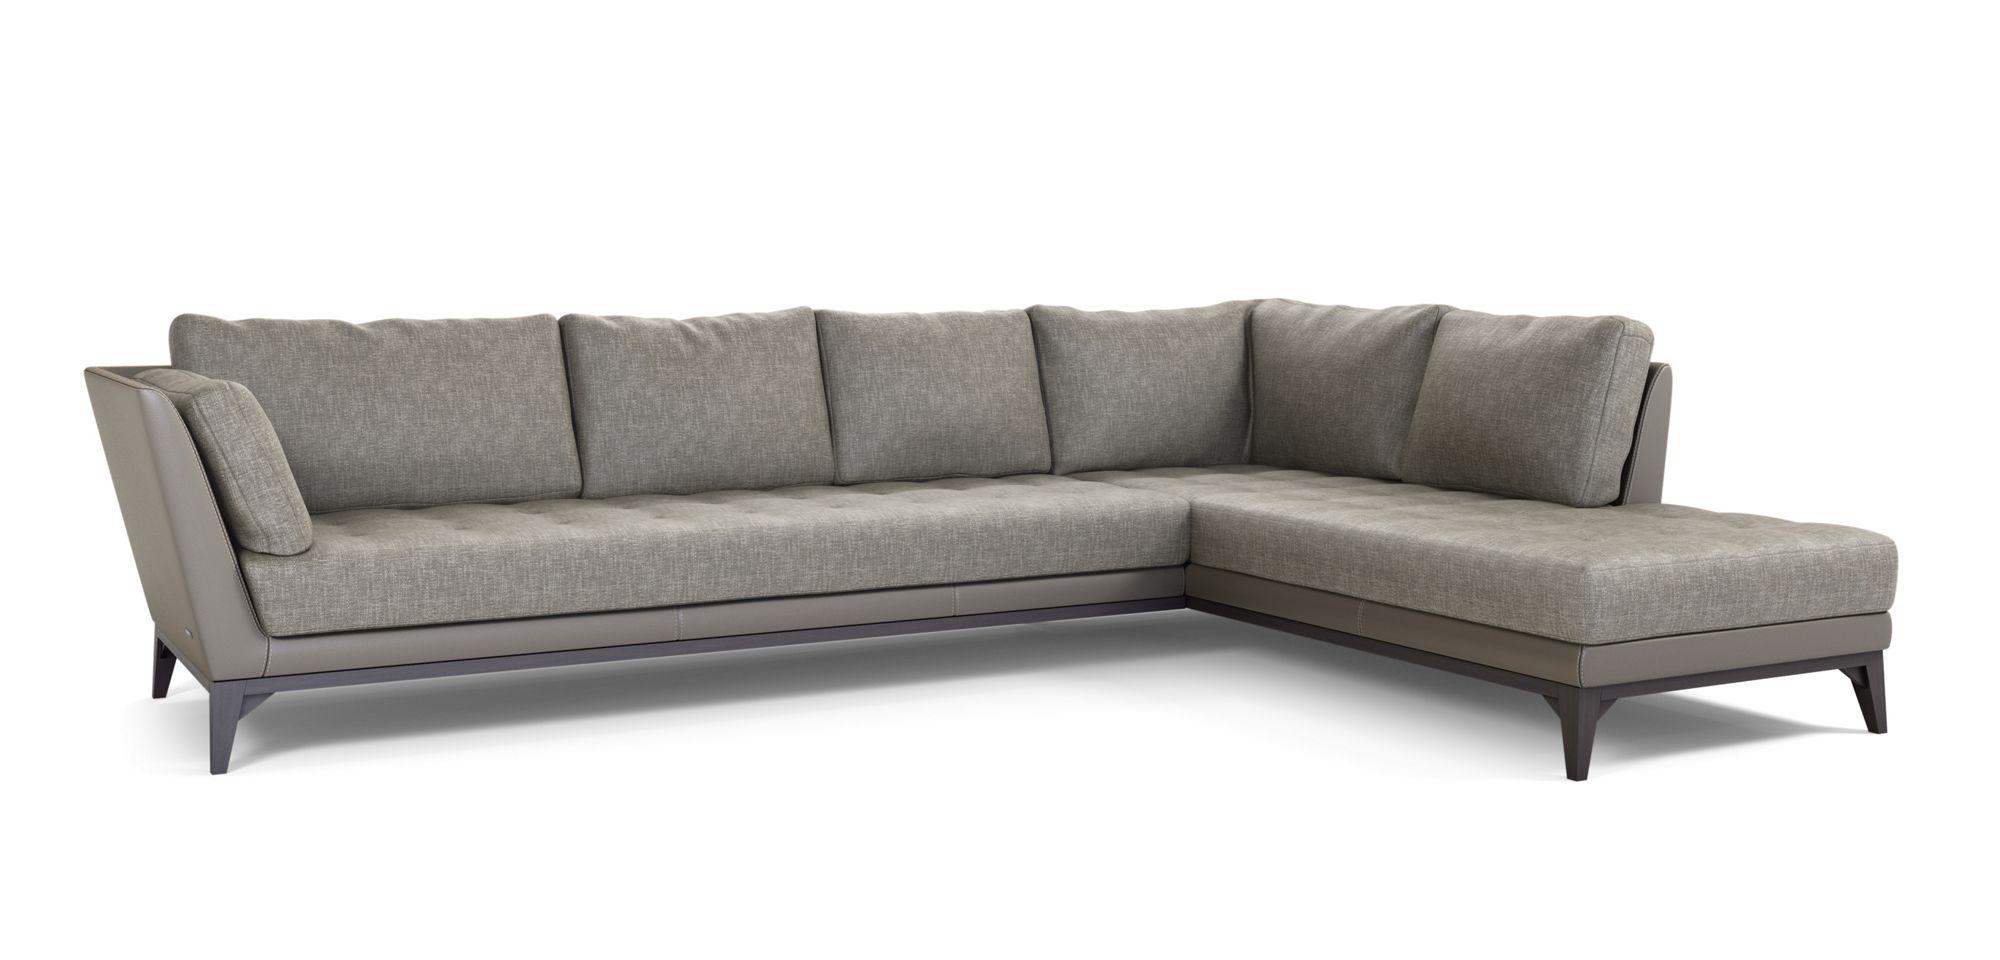 Perception Corner Composition Nouveaux Classiques Collection Roche Bobois Sofa Roche Bobois Sofa Quality Furniture